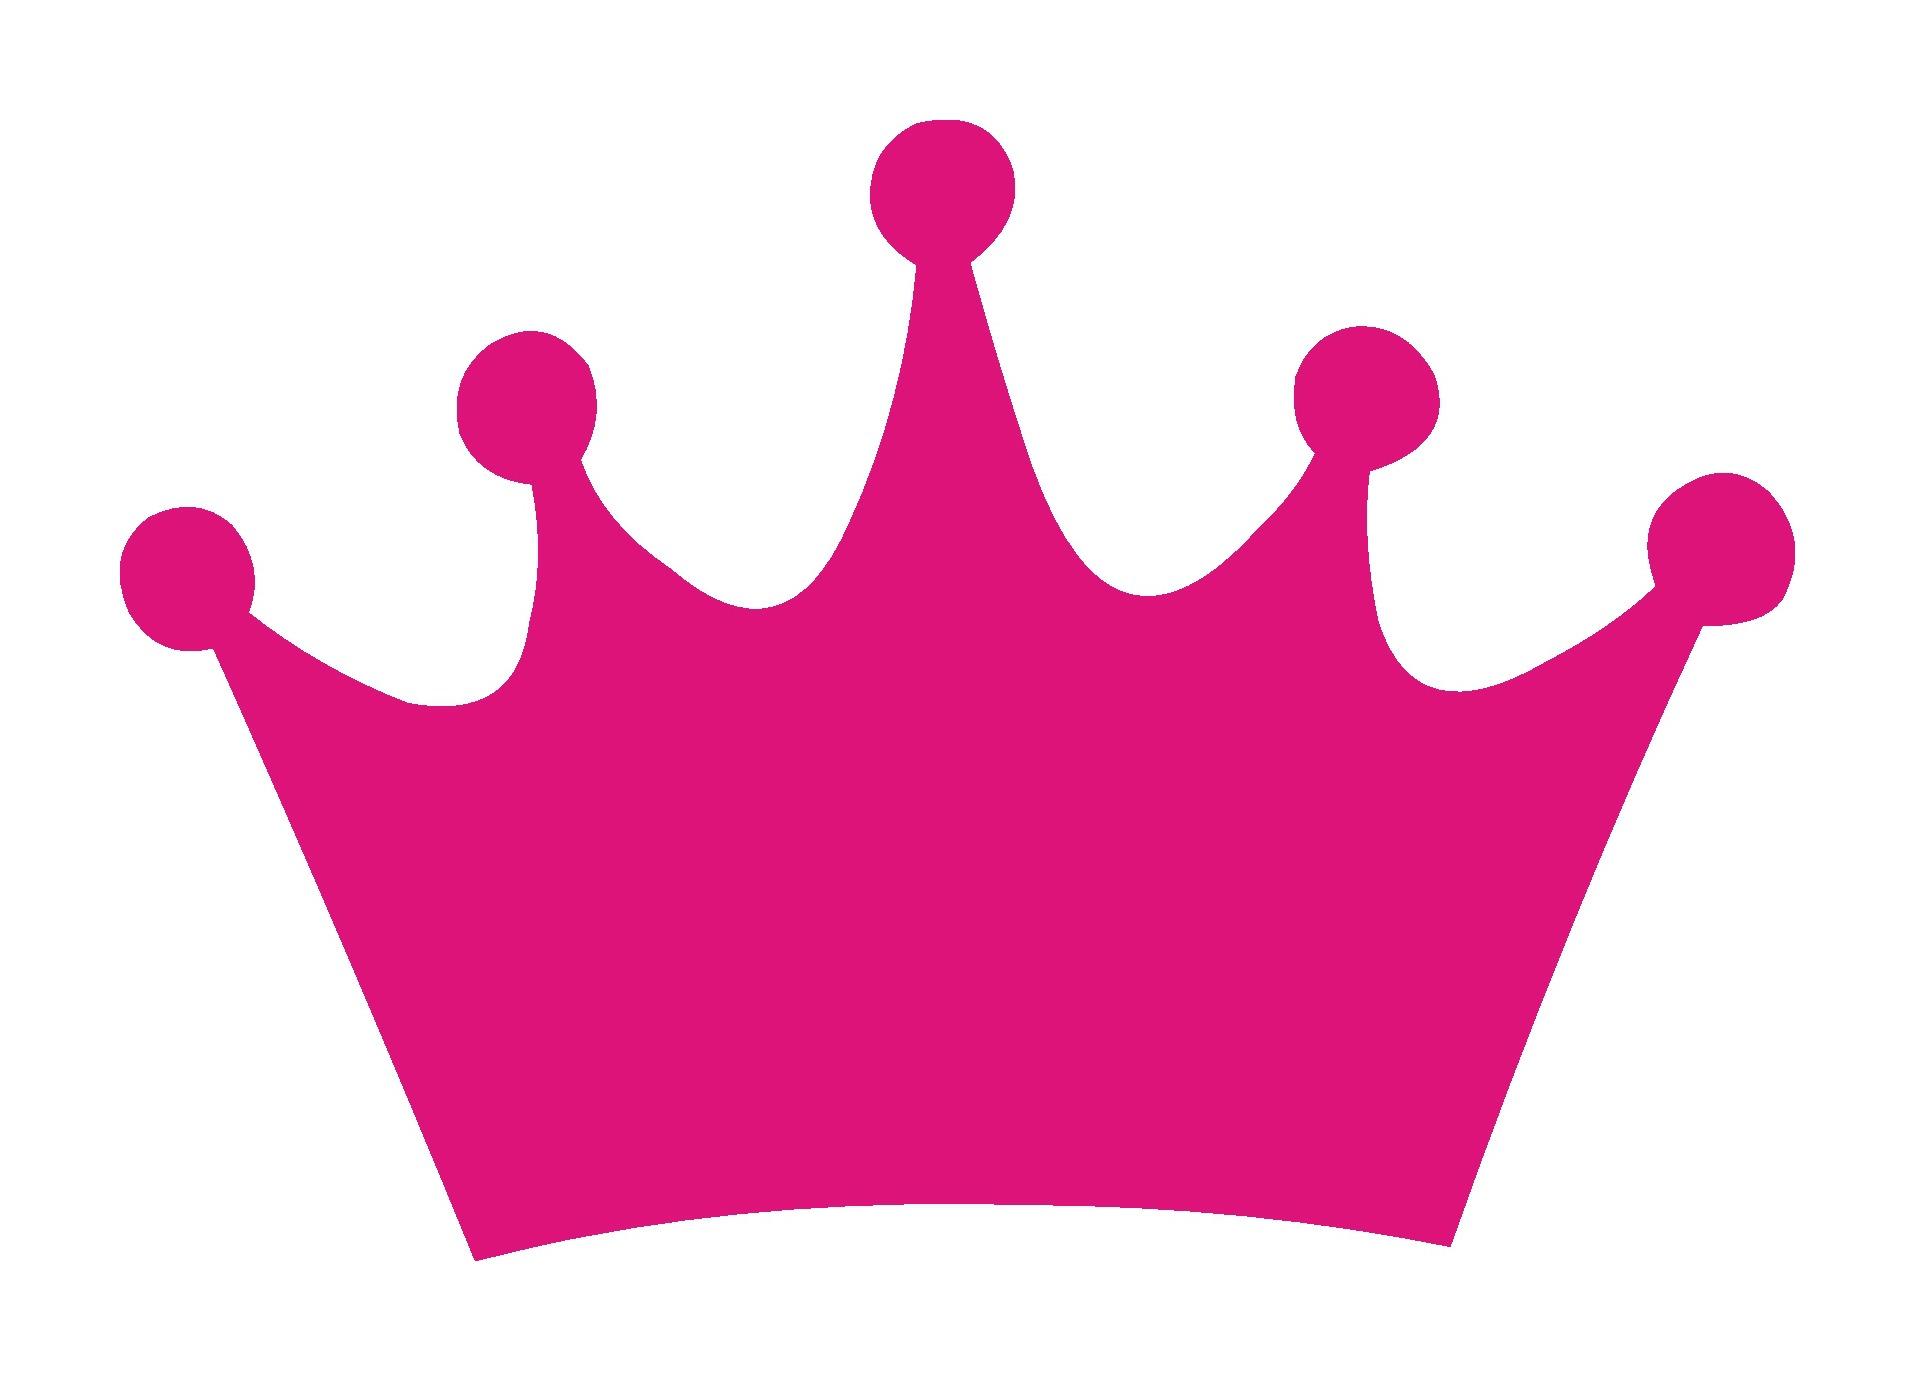 Tiara Princess Crown Clipart Free Image -Tiara princess crown clipart free image vector clip art-15